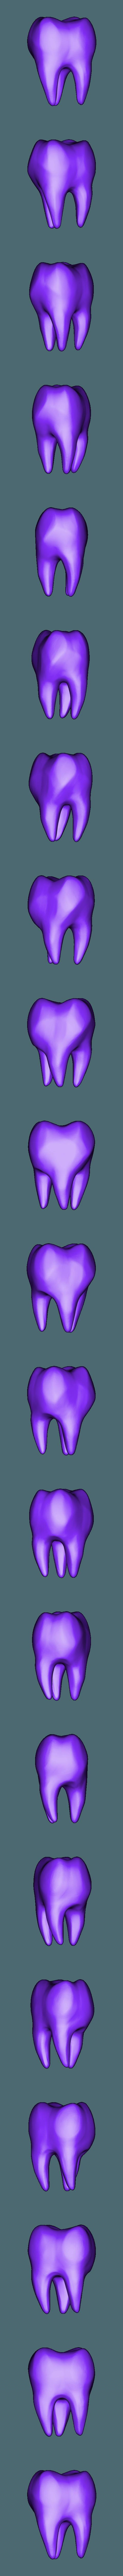 Tooth-01.obj Download 3DS file Tooth • 3D printer design, Skazok